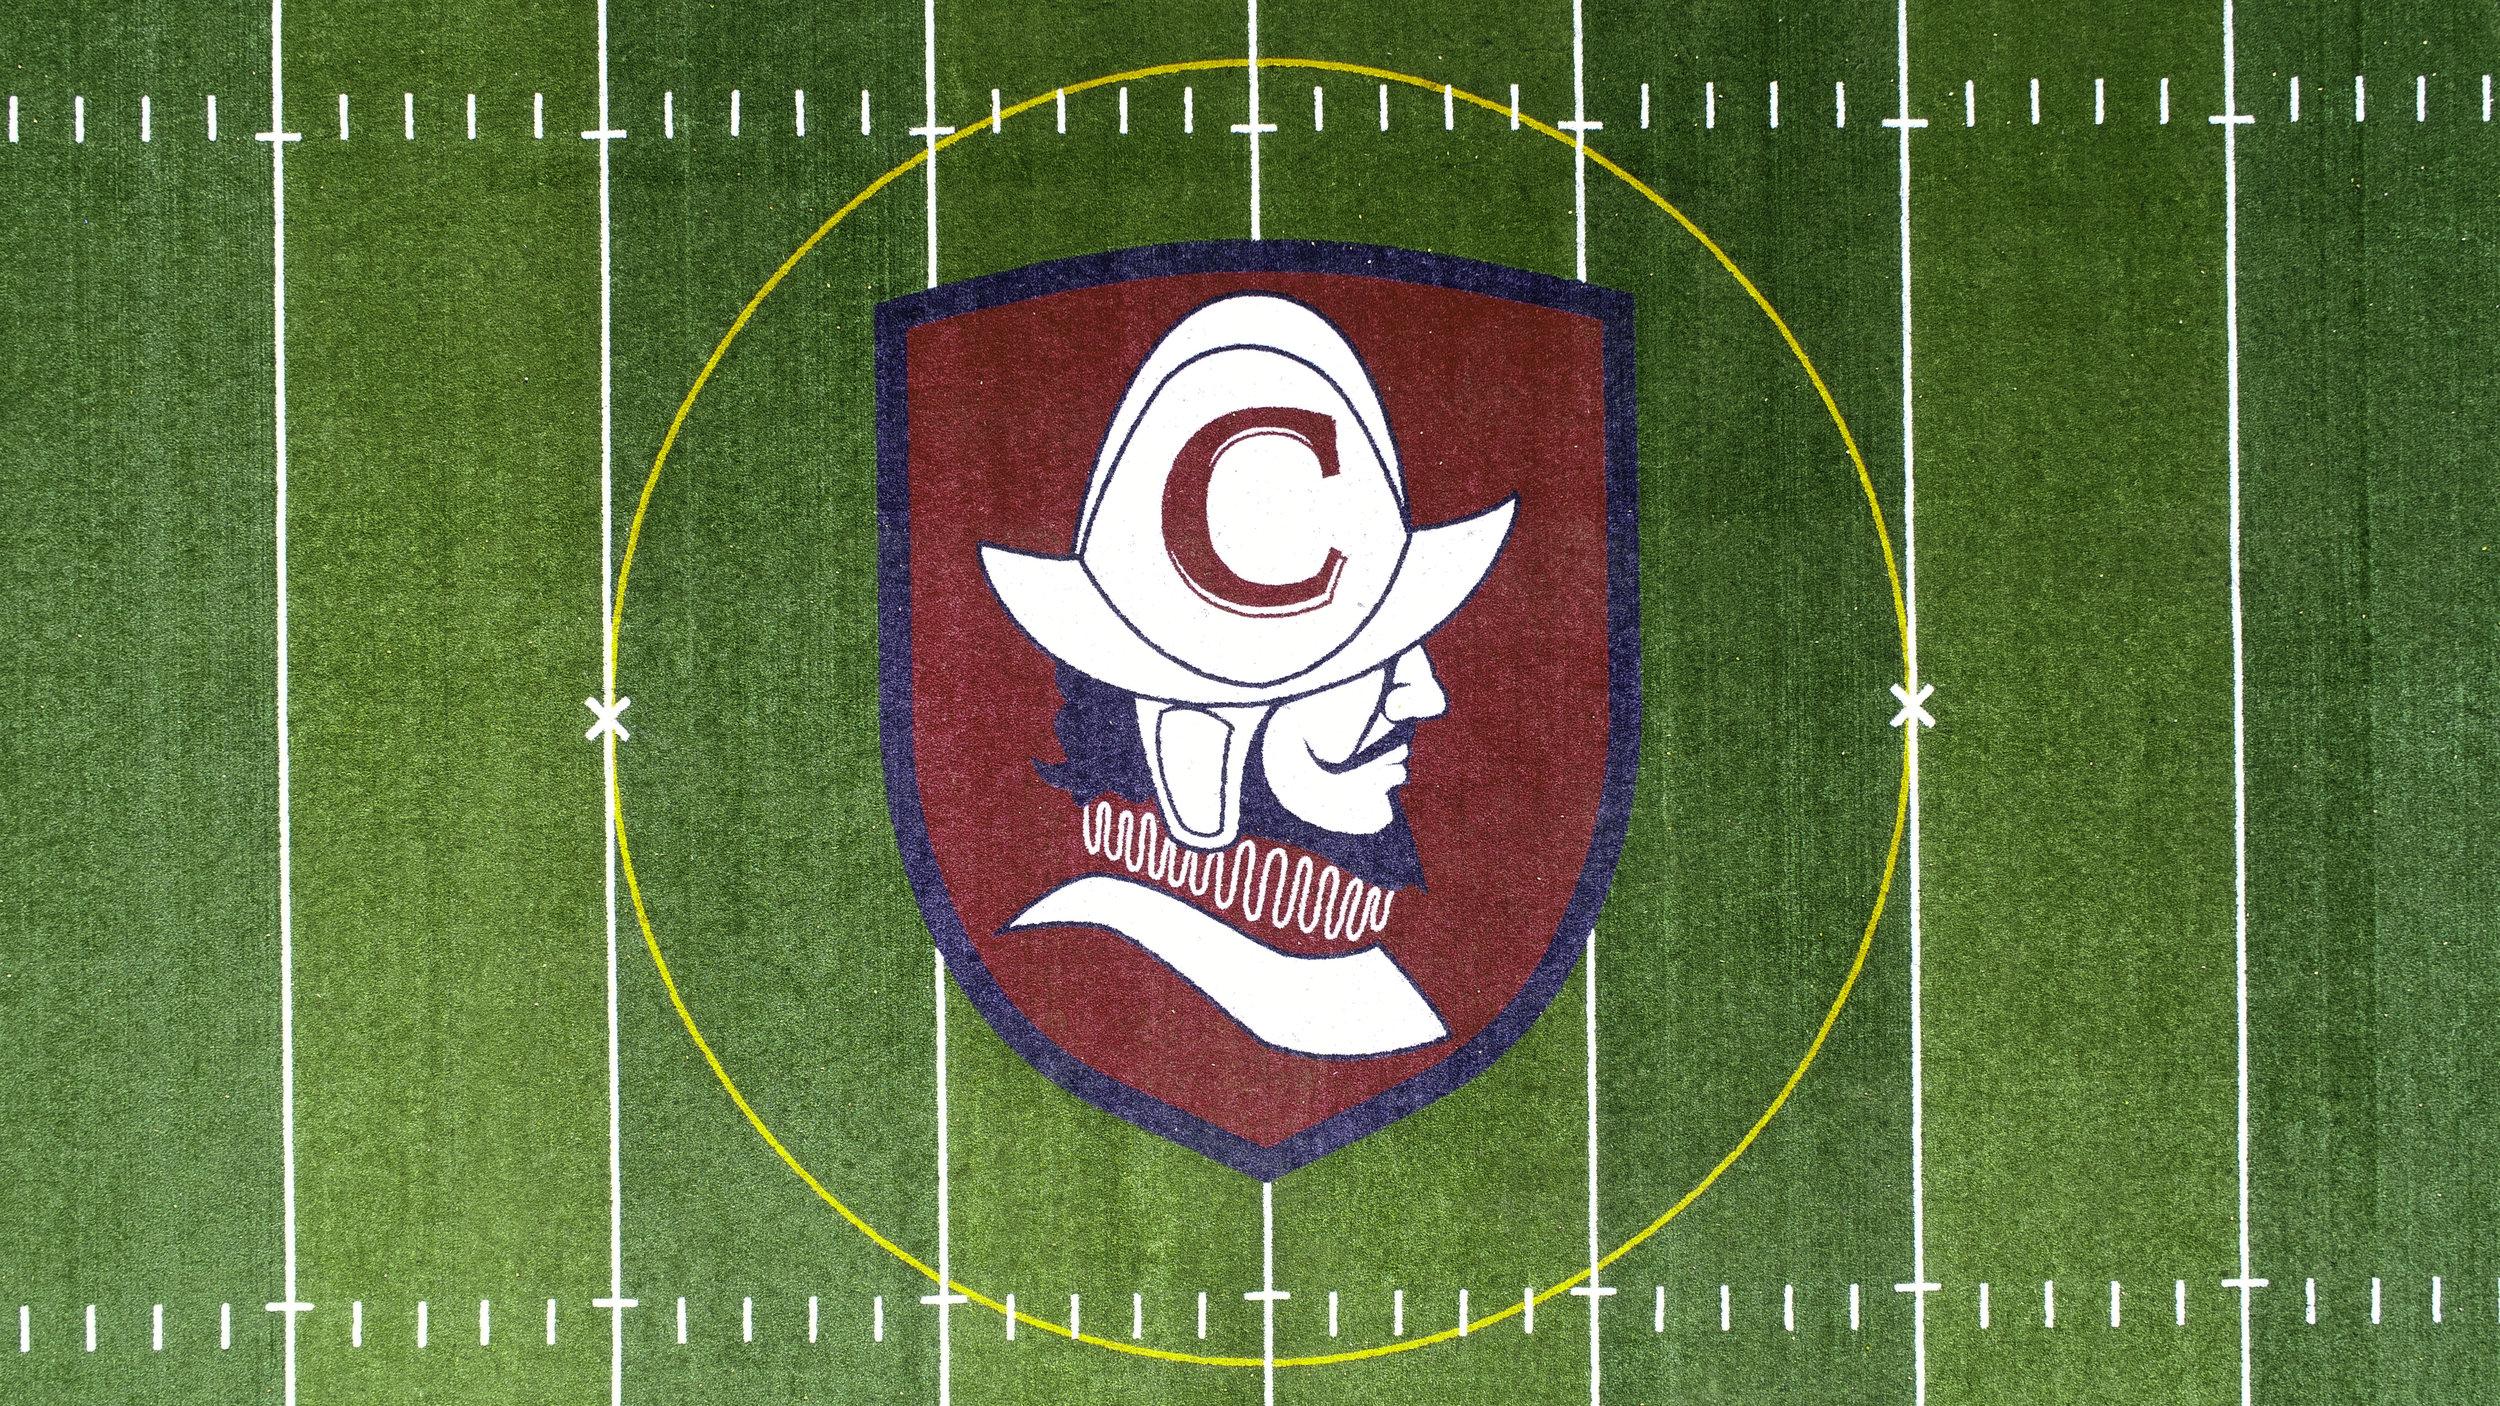 20180121-Coronado High School (1).jpg